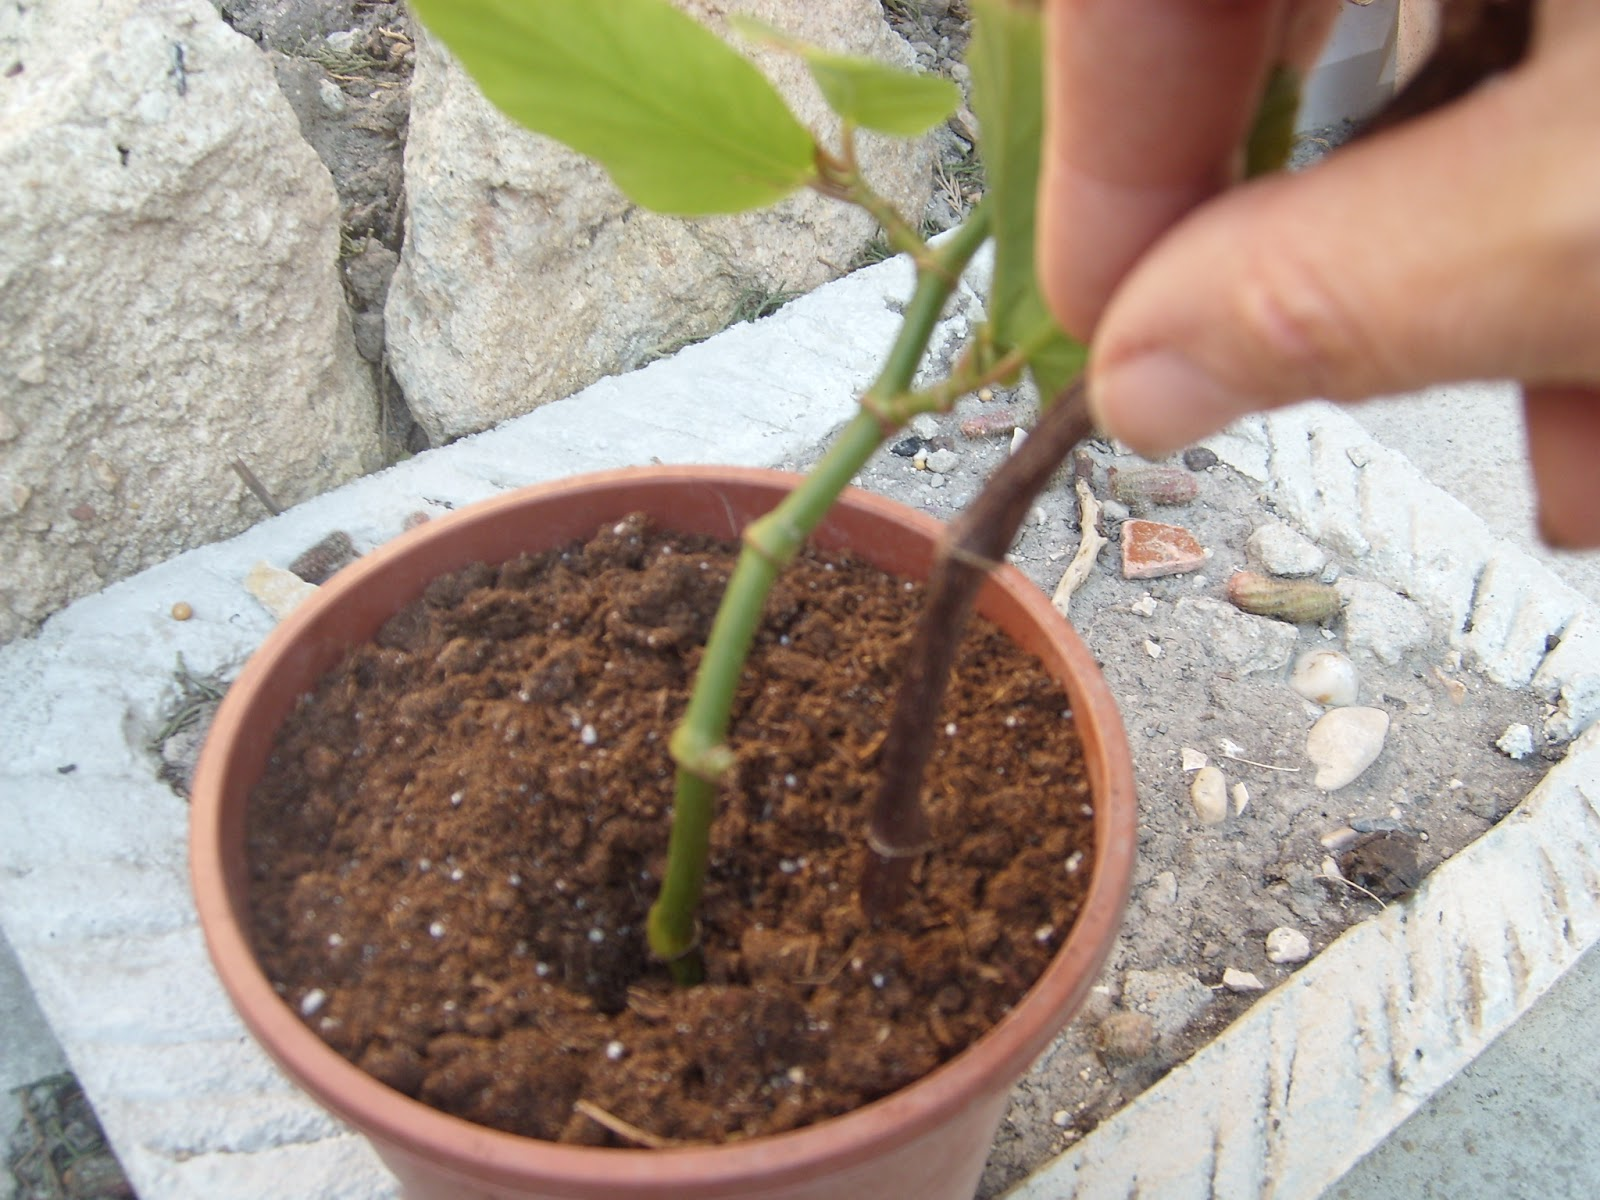 le jardin de pascaline bouturer le b gonia maculata. Black Bedroom Furniture Sets. Home Design Ideas